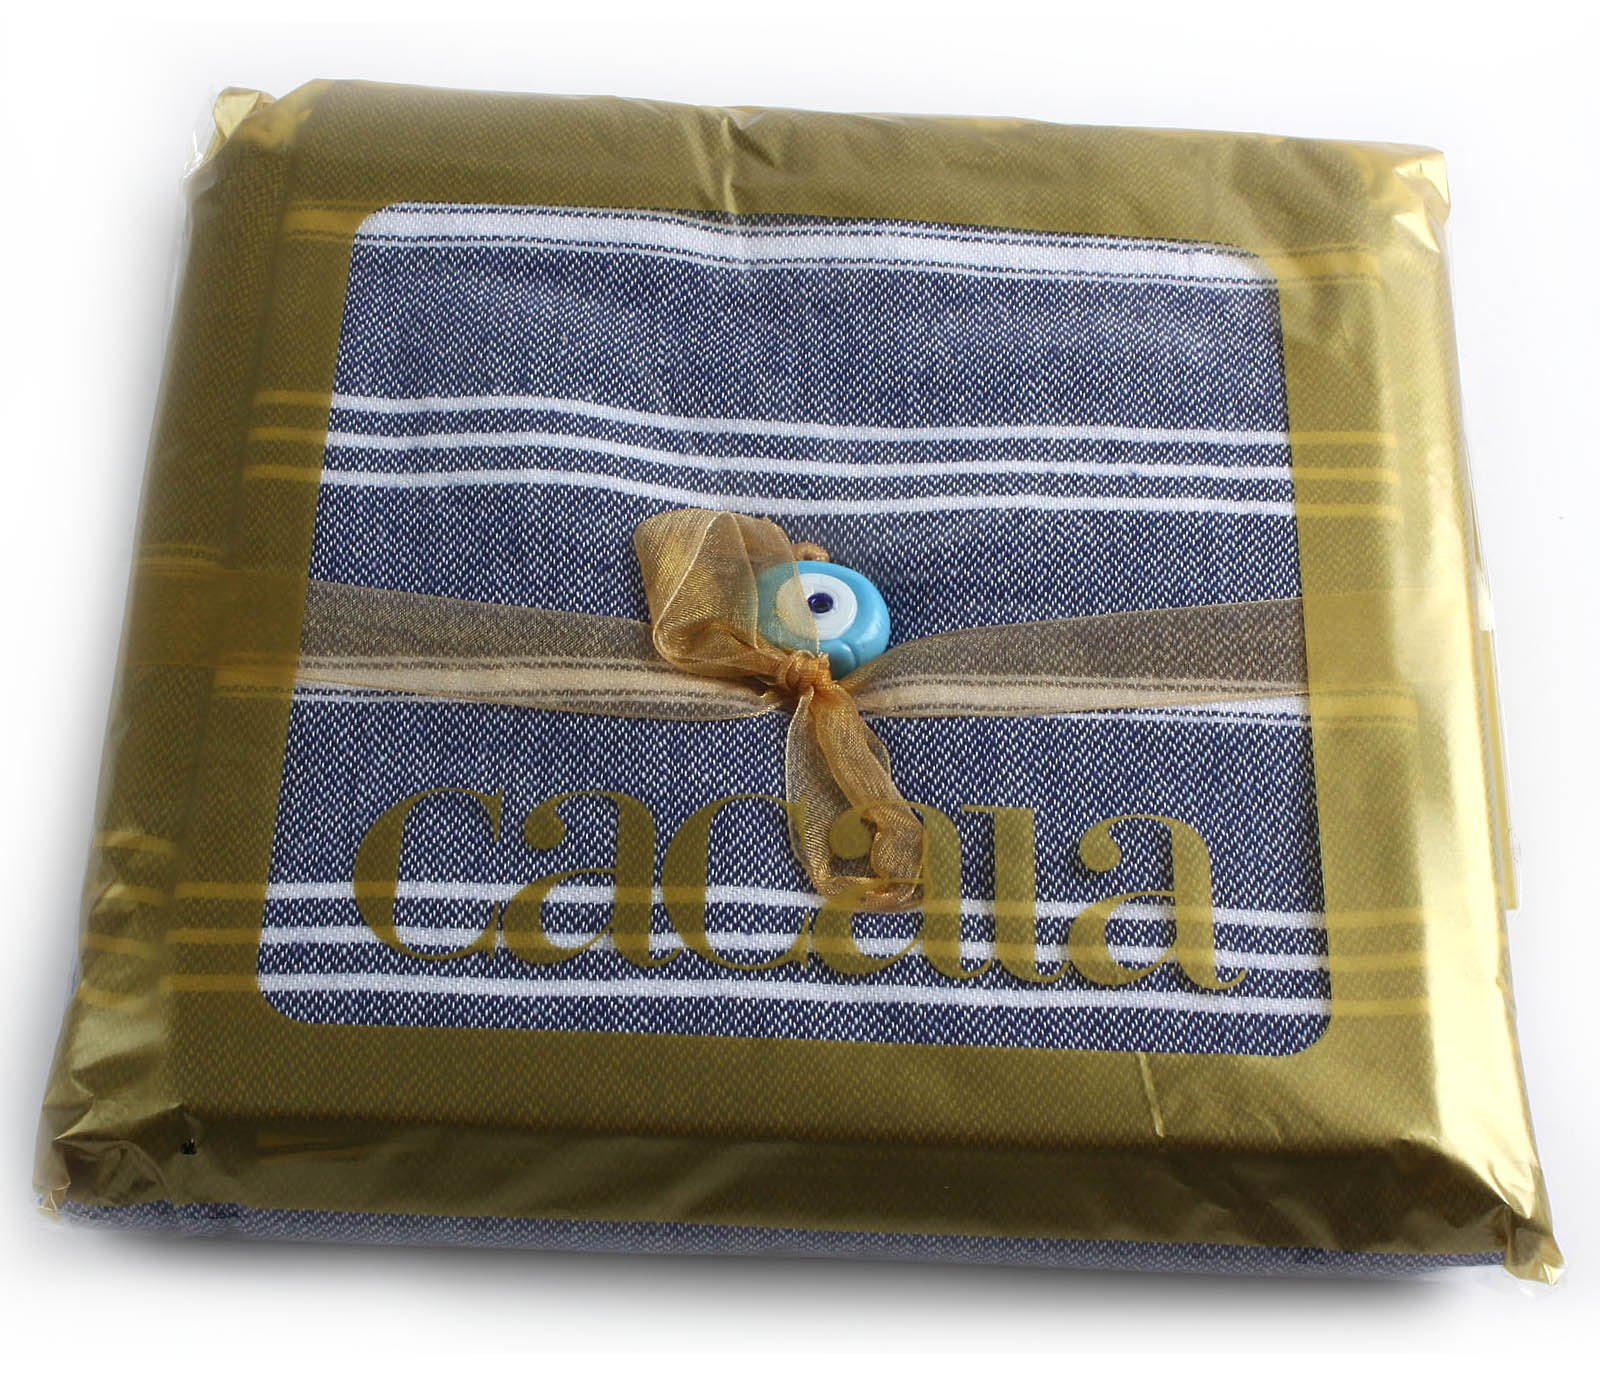 Cacala 100% Cotton Pestemal Turkish Bath Towel, 37 x 70, Dark Blue by Cacala (Image #2)